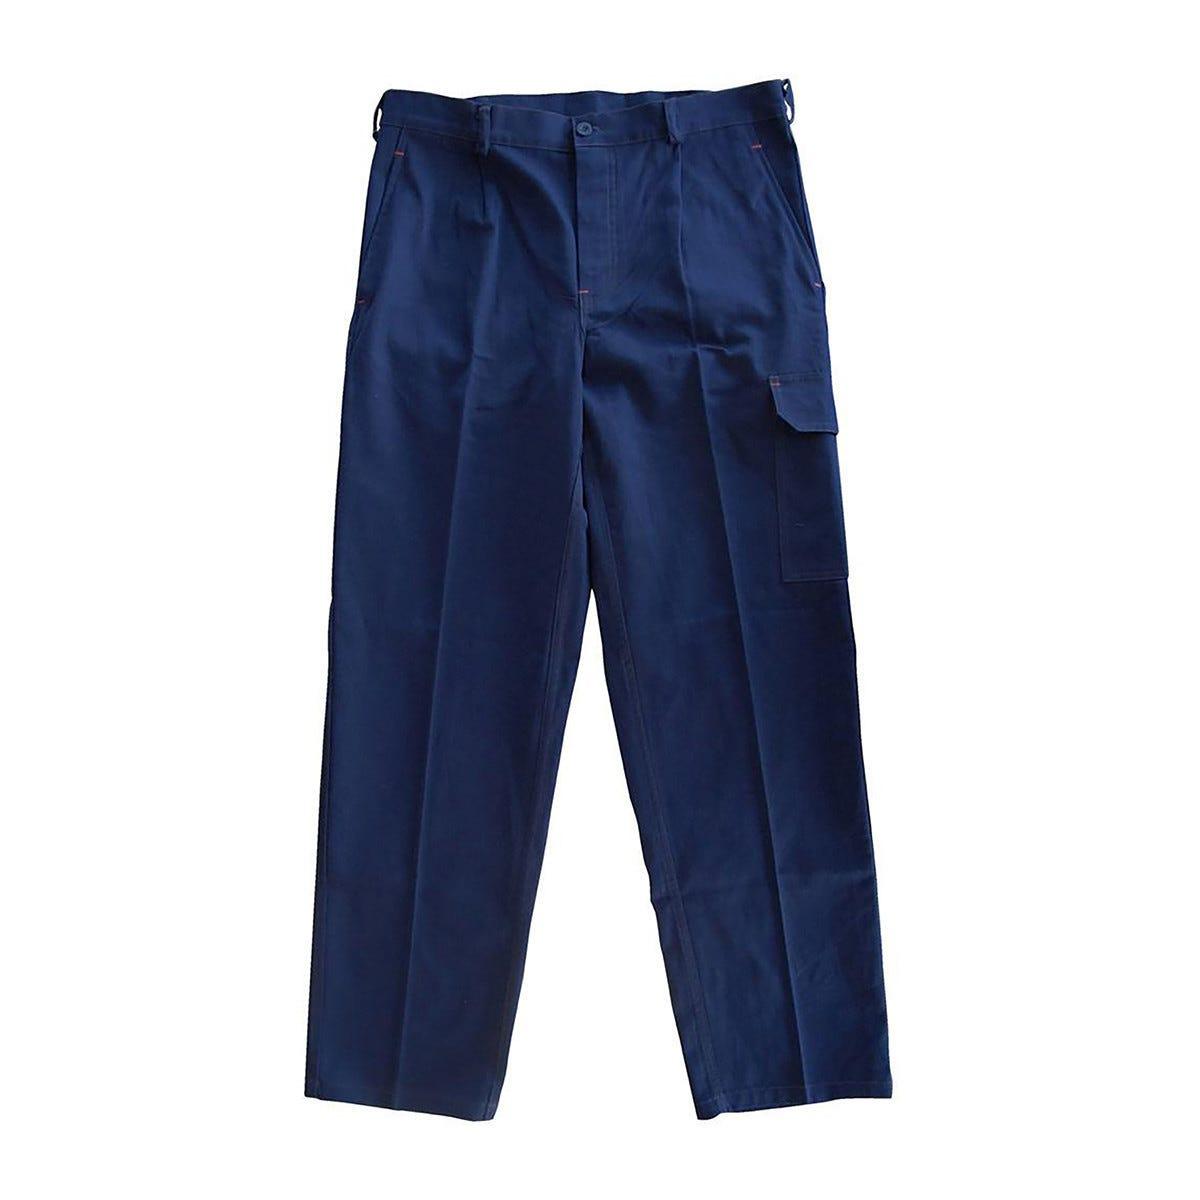 Pantalone Super Taglia 46 Colore Blu